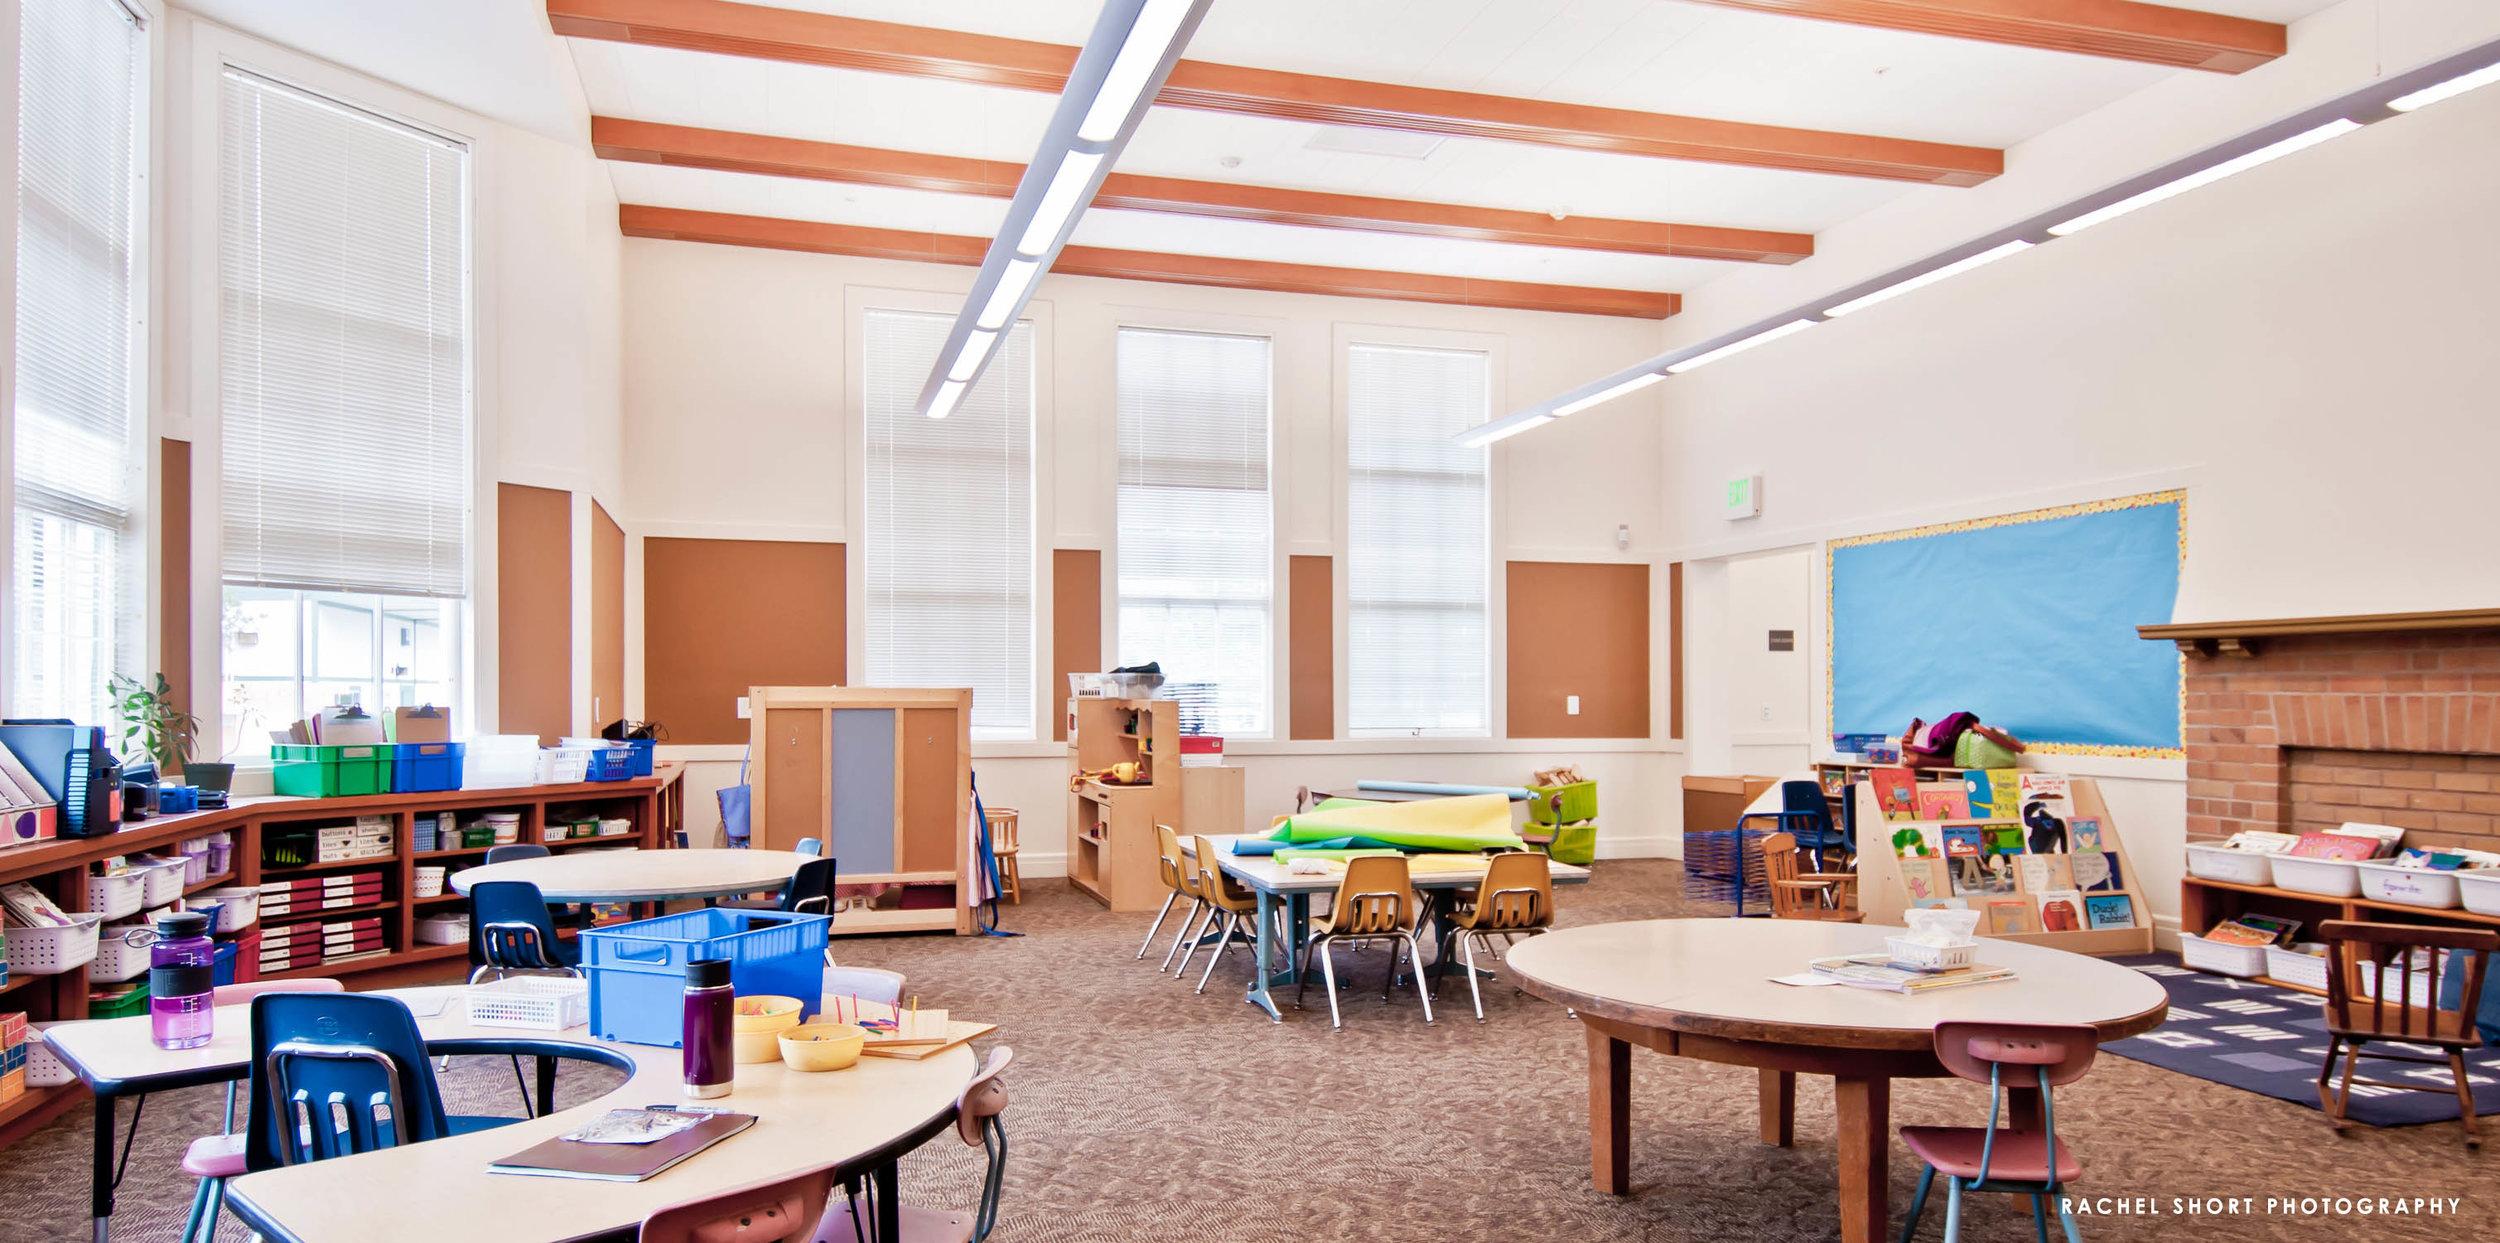 BEACH ELEMENTARY SCHOOL - PIEDMONT, CA